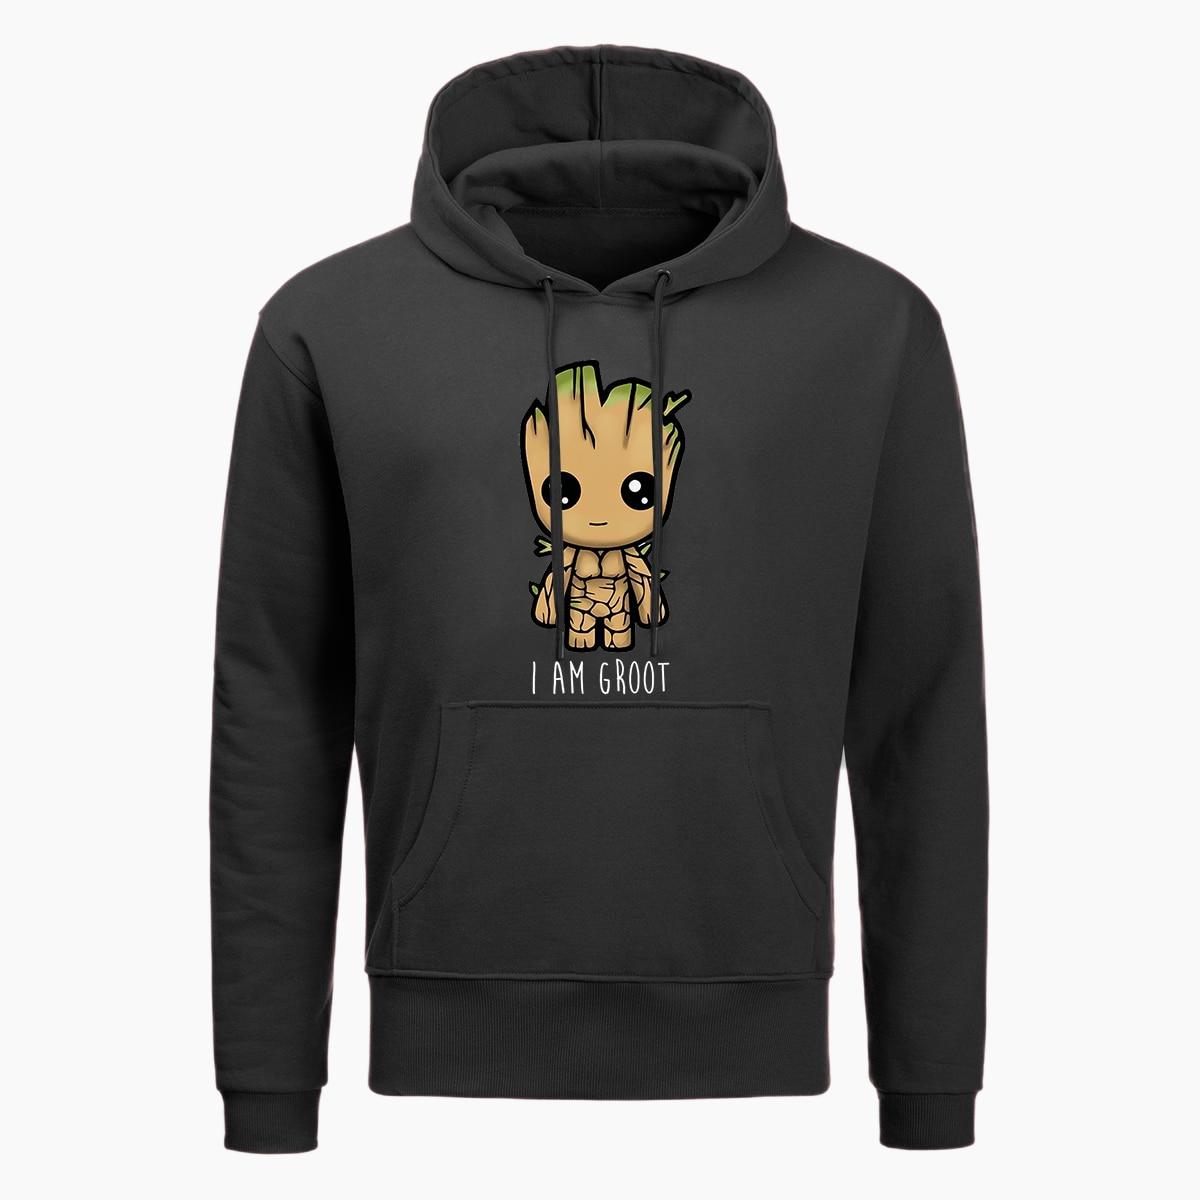 2019 New I Am Groot Hoodie Men Fashion Hoodie Casual Marvel Anime Hoodies Autumn Winter Hip Hop Streetwear Harajuku Hoody